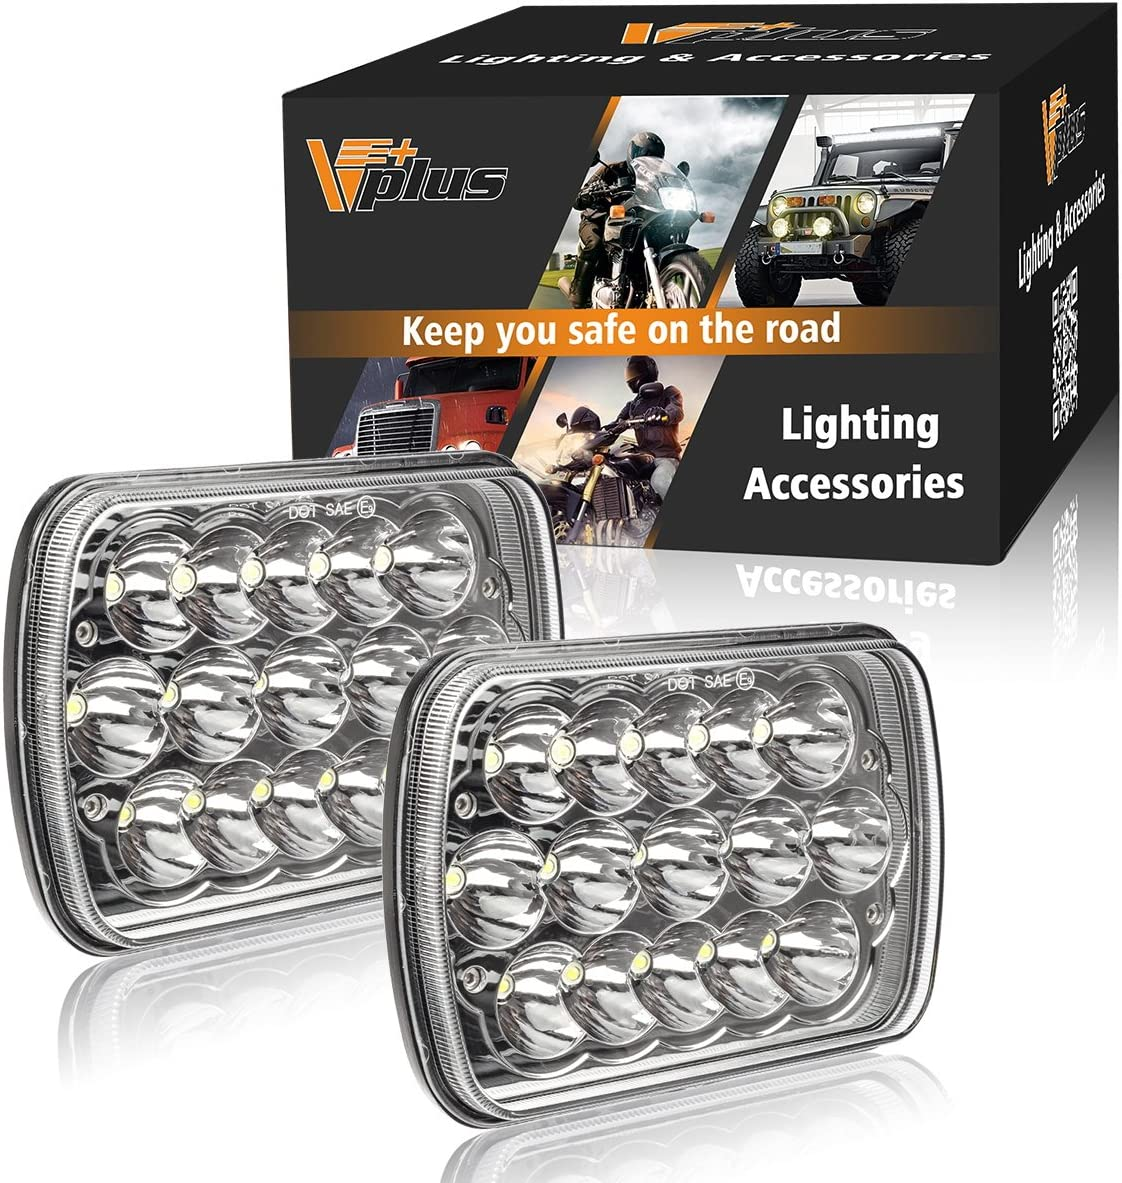 Partsam 2PCS Rectangle H6054 LED Headlights 5x7 7x6 Headlamp Hi/Low Sealed Beam H4 9003 Plug 6054 H5054 Compatible with Chevy S10 Blazer Express Van/Jeep Wrangler YJ XJ Cherokee Truck Ford Van